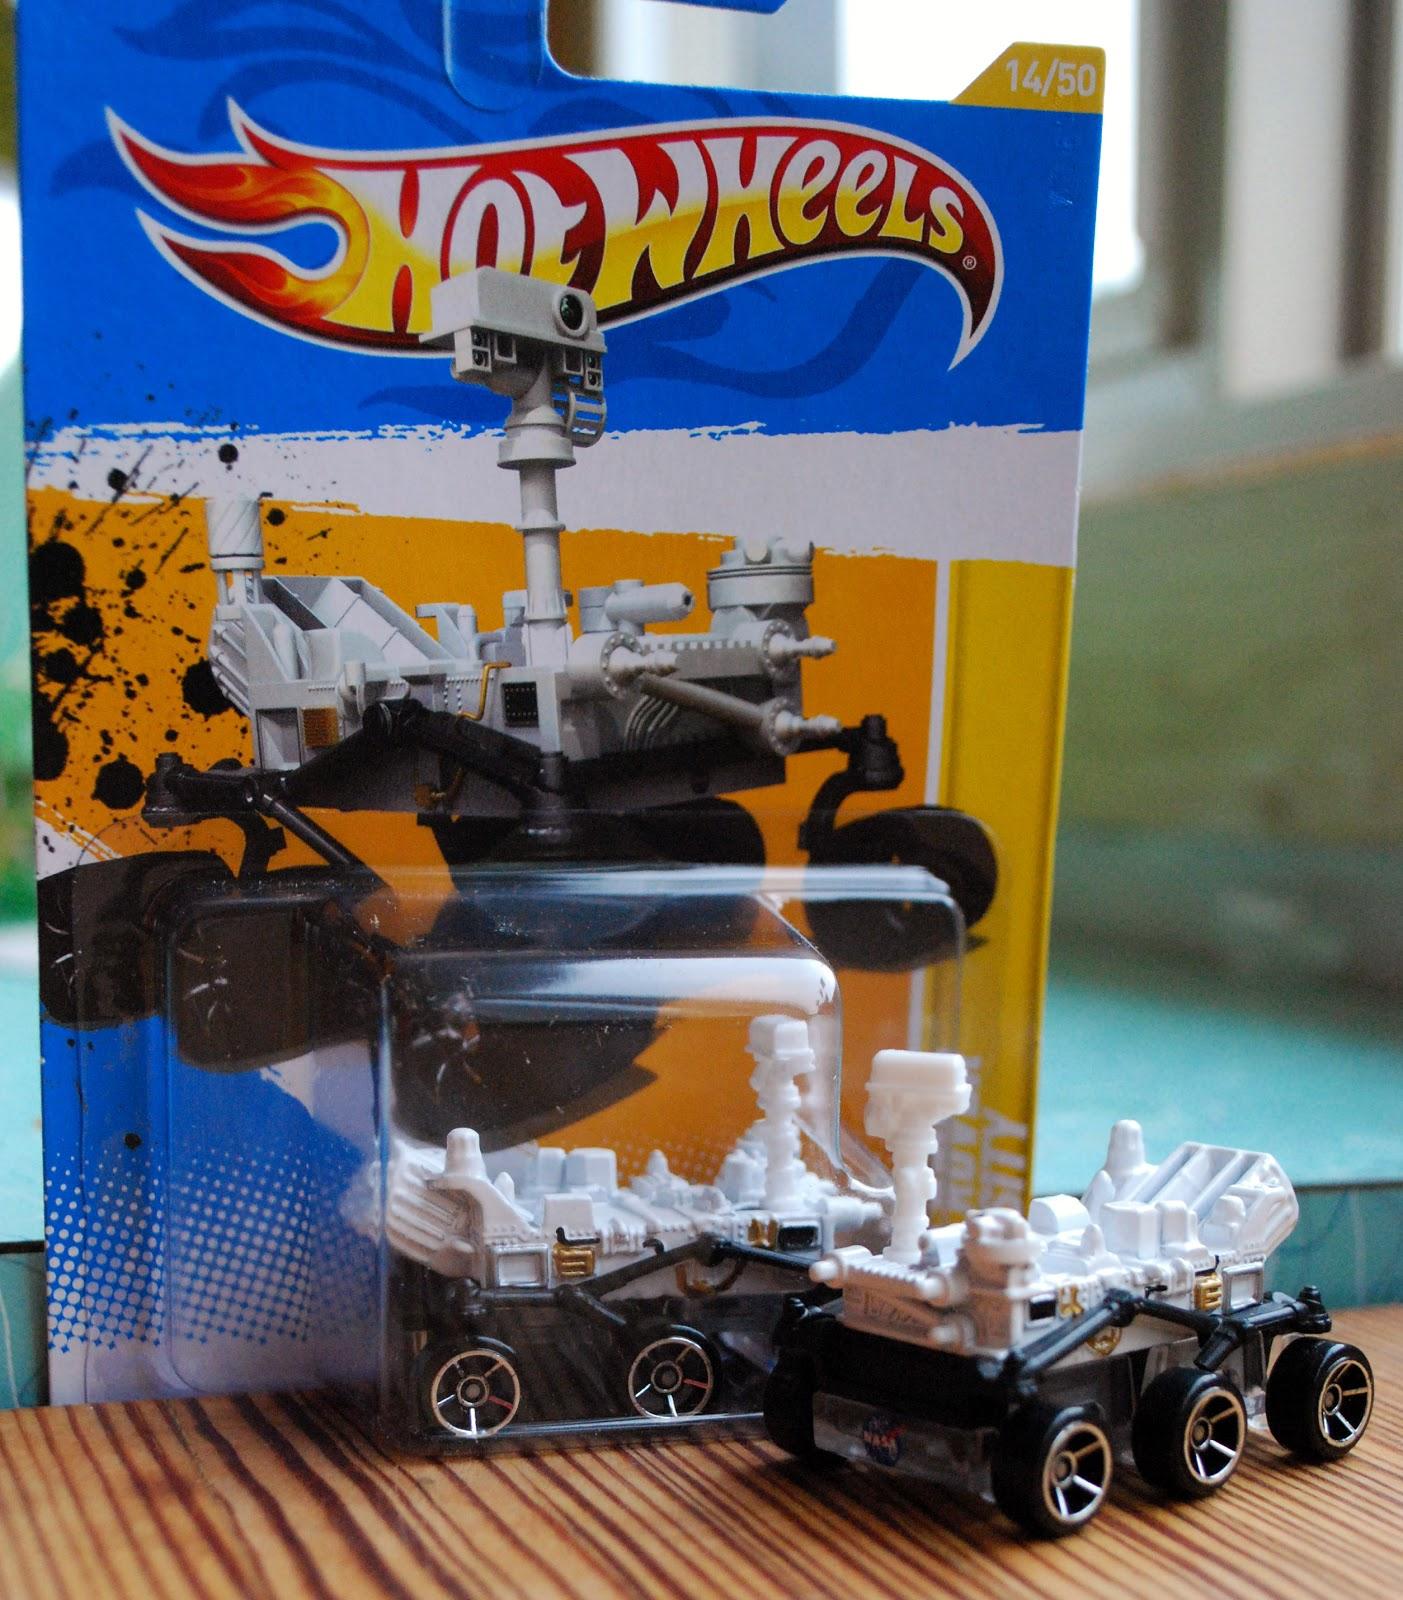 mars rover ultimo mensaje - photo #18